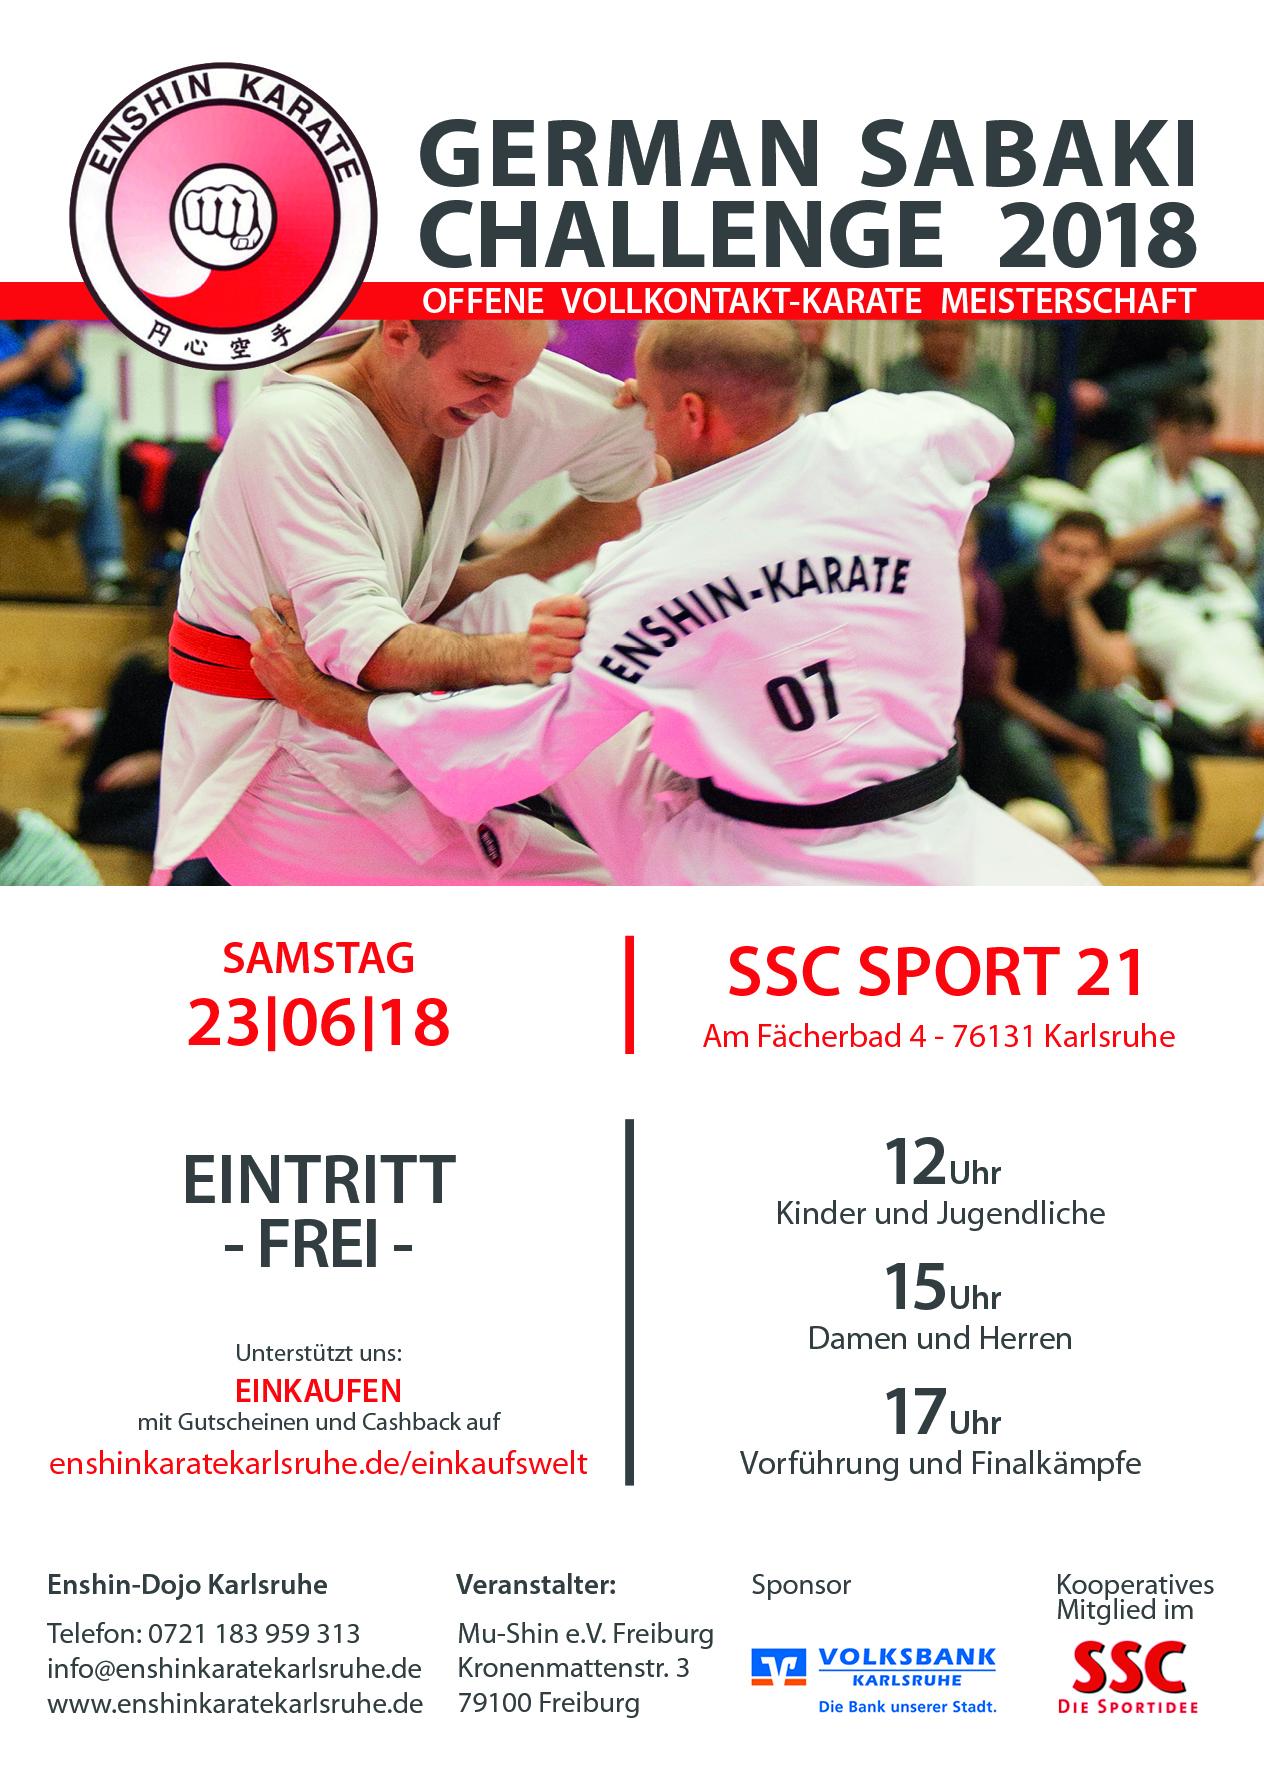 German Sabaki Challenge 2018